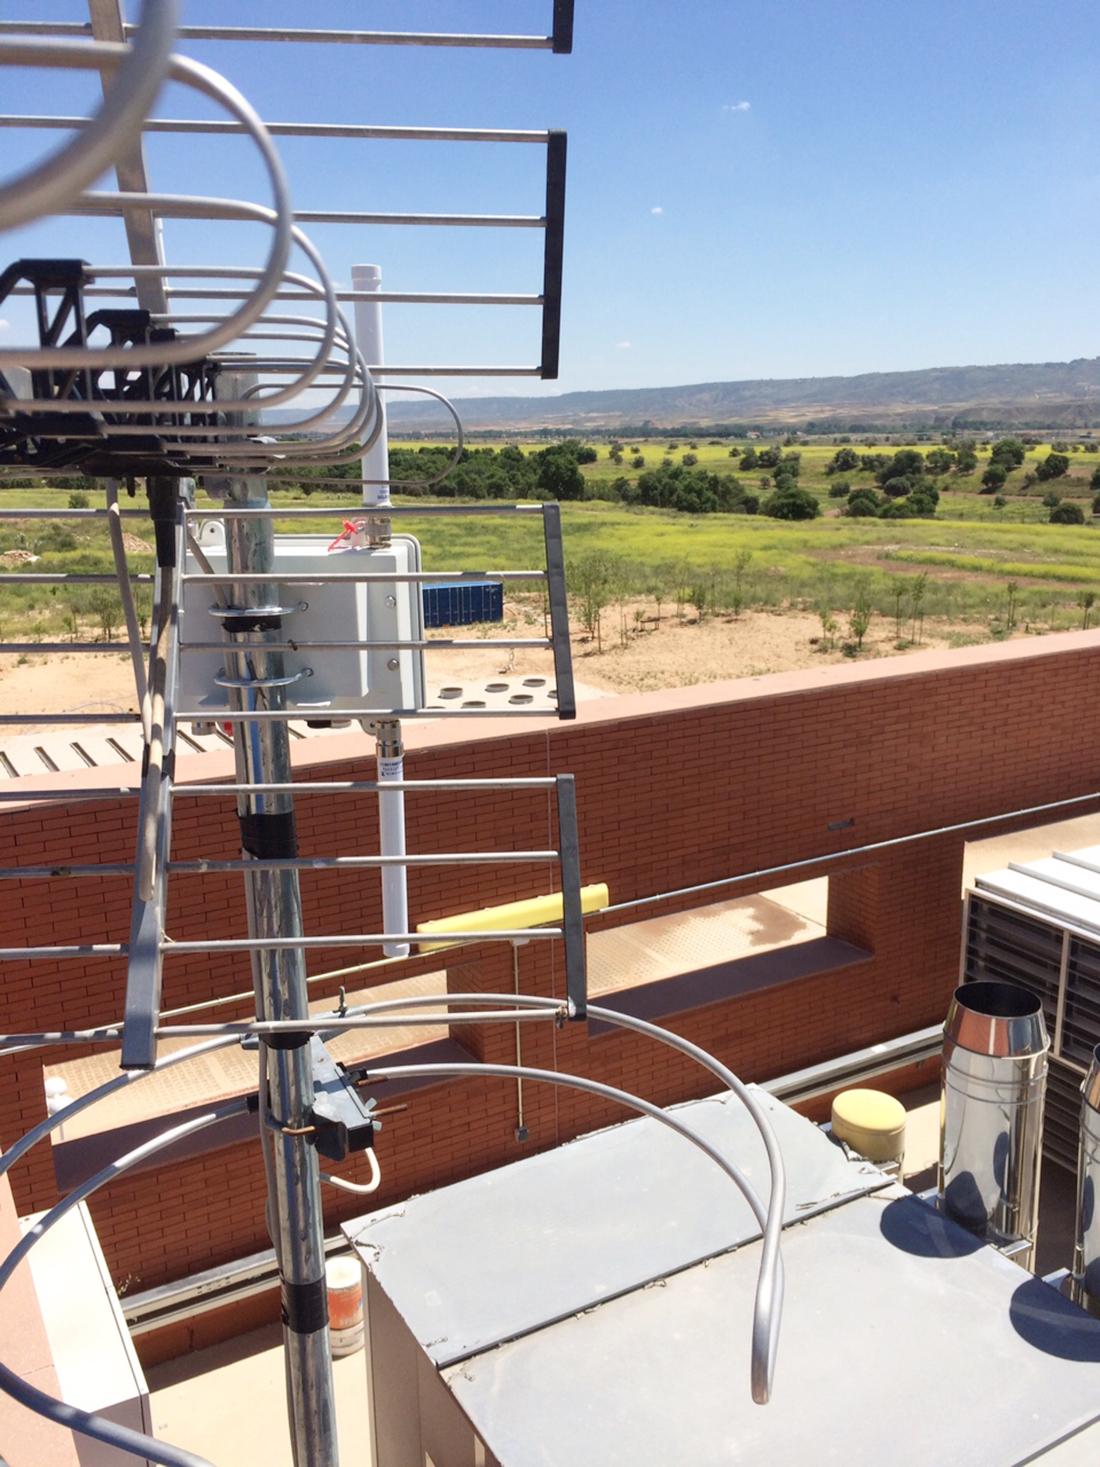 Meshlium IoT Gateway installed next to iMETland